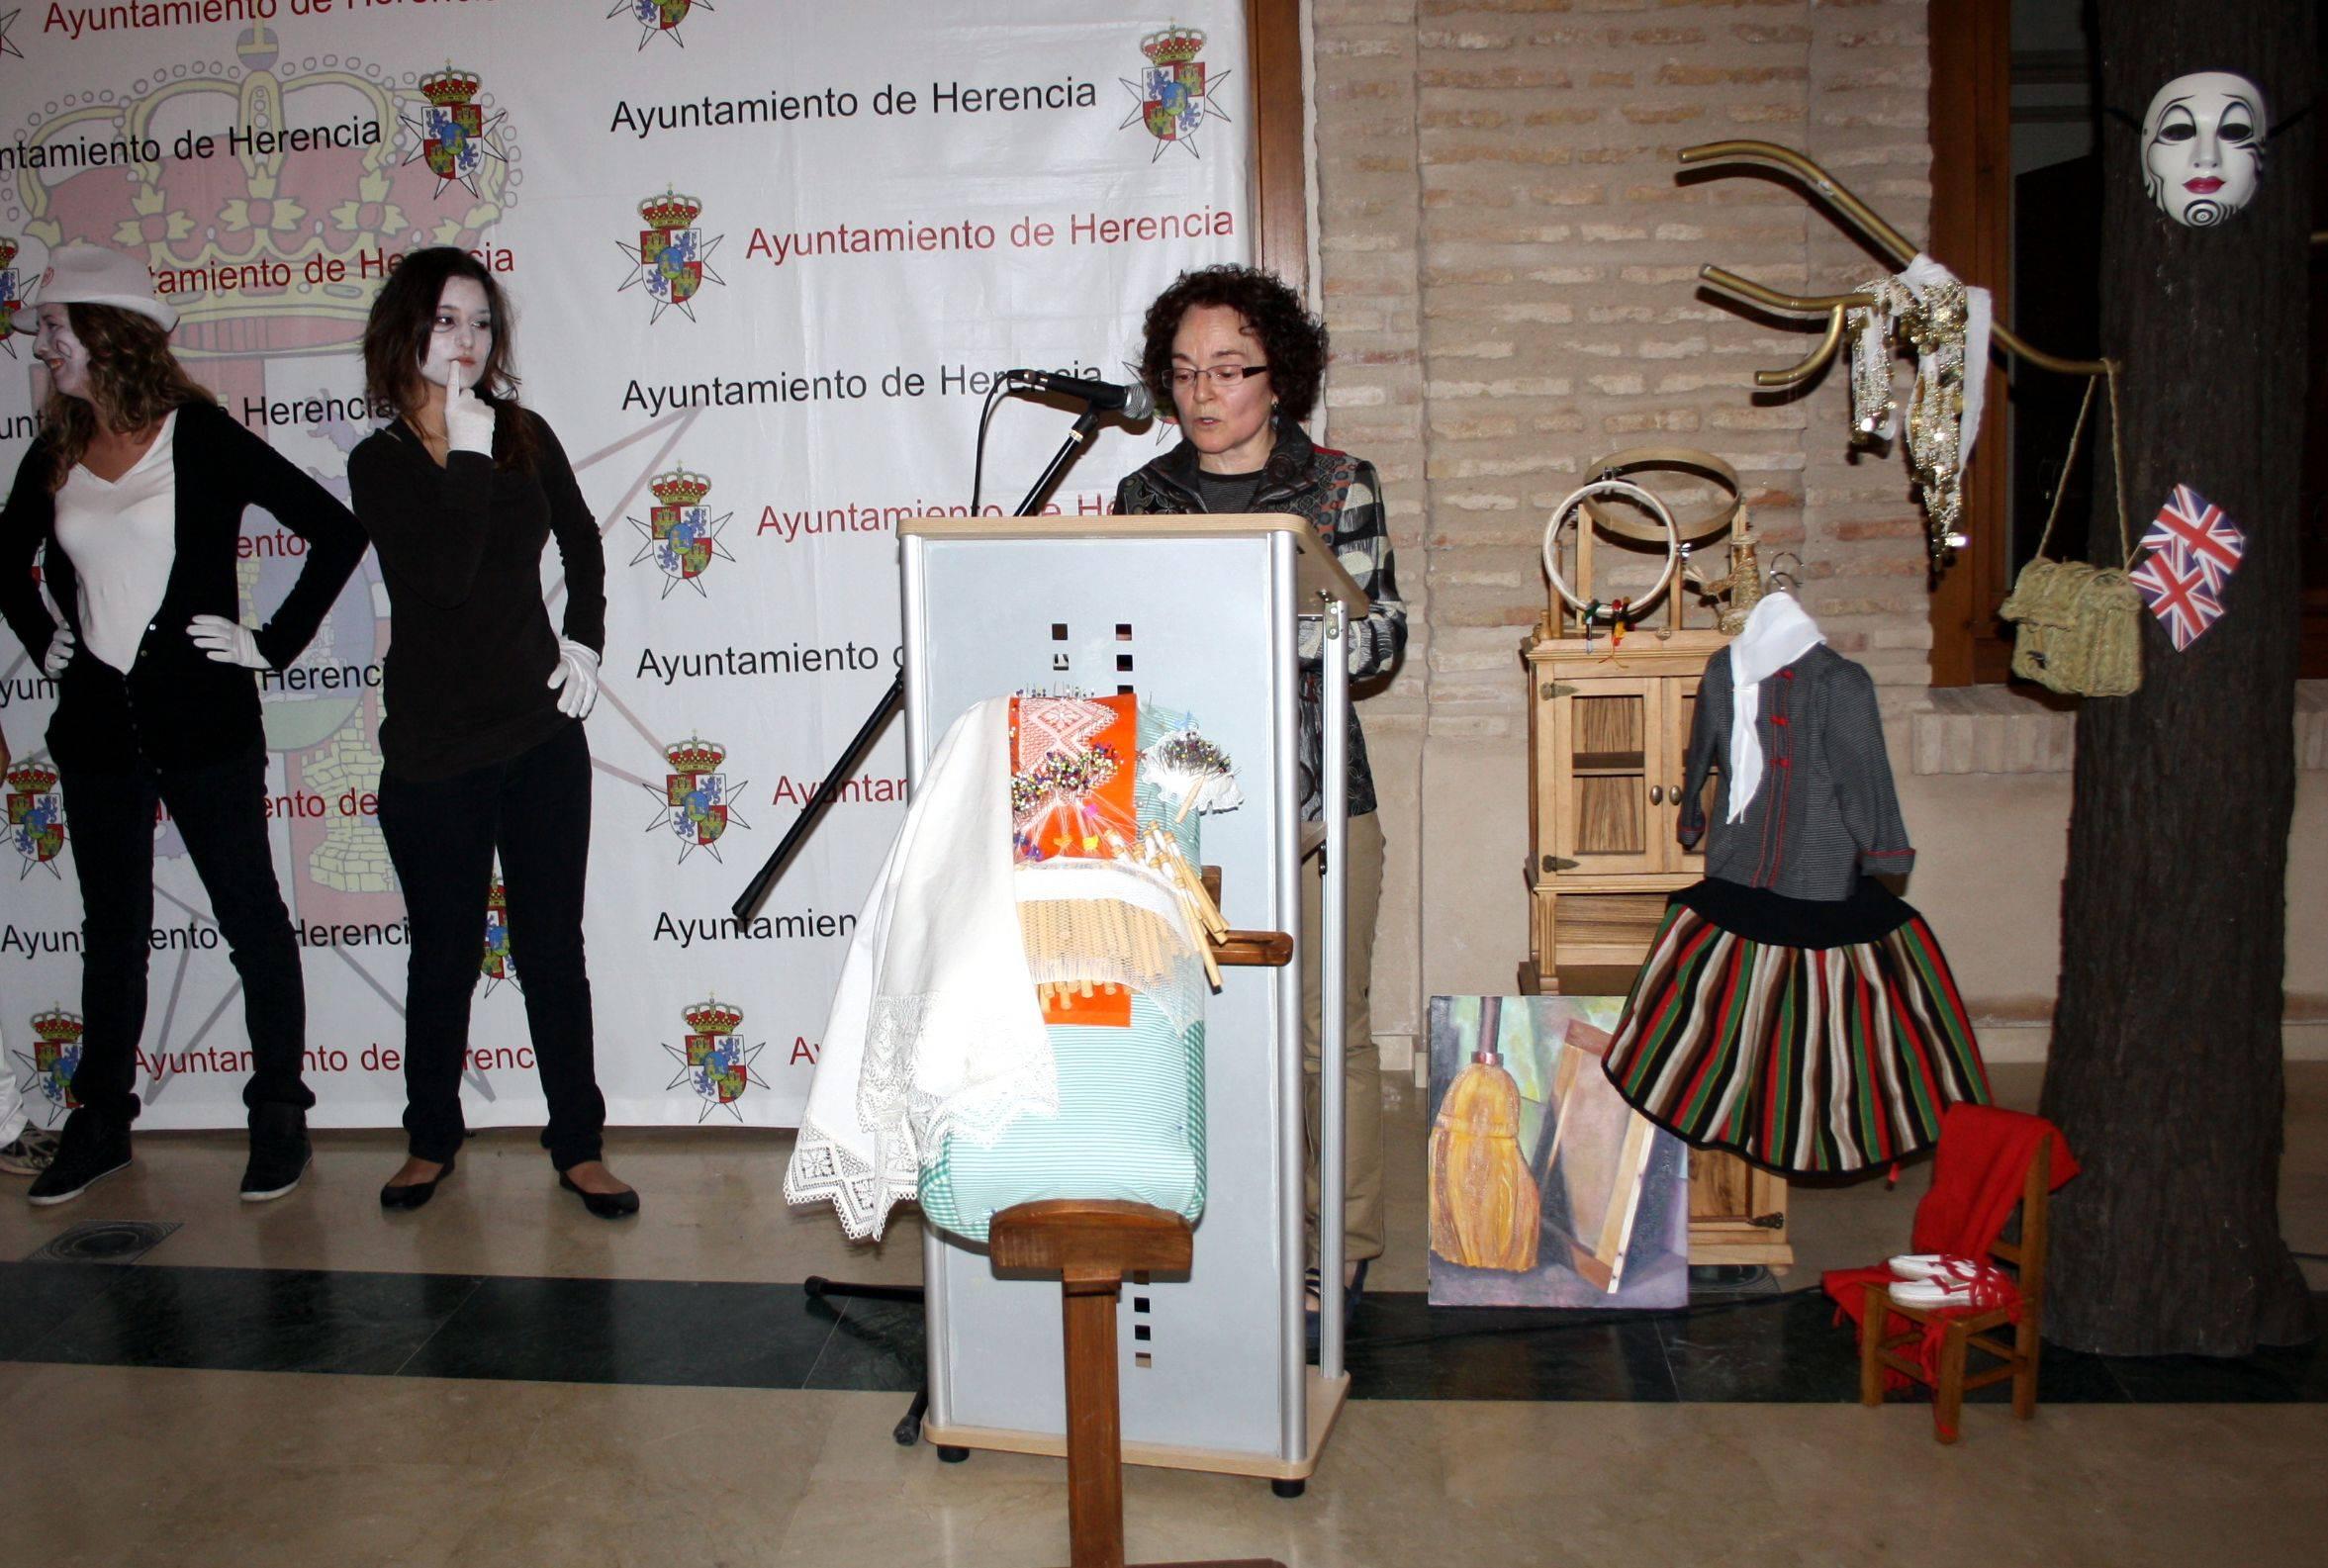 herencia carmen gomez director up - Diputación invertirá 480.000 euros en las Universidades Populares de 81 municipios